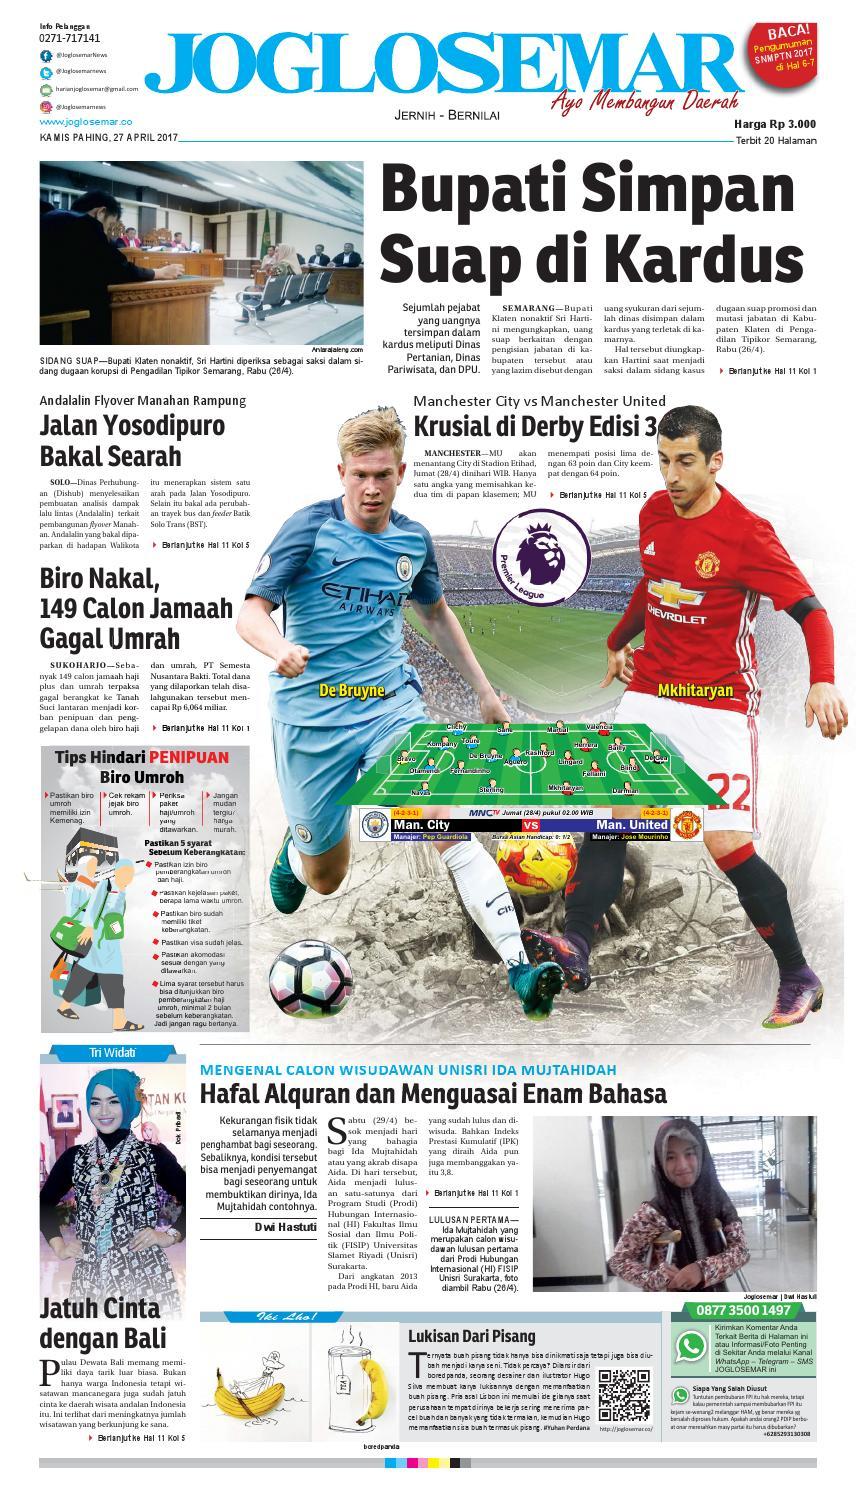 E Paper 27 April 2017 By Pt Joglosemar Prima Media Issuu Keripik Tahu Alip Bintang Terang Pgp